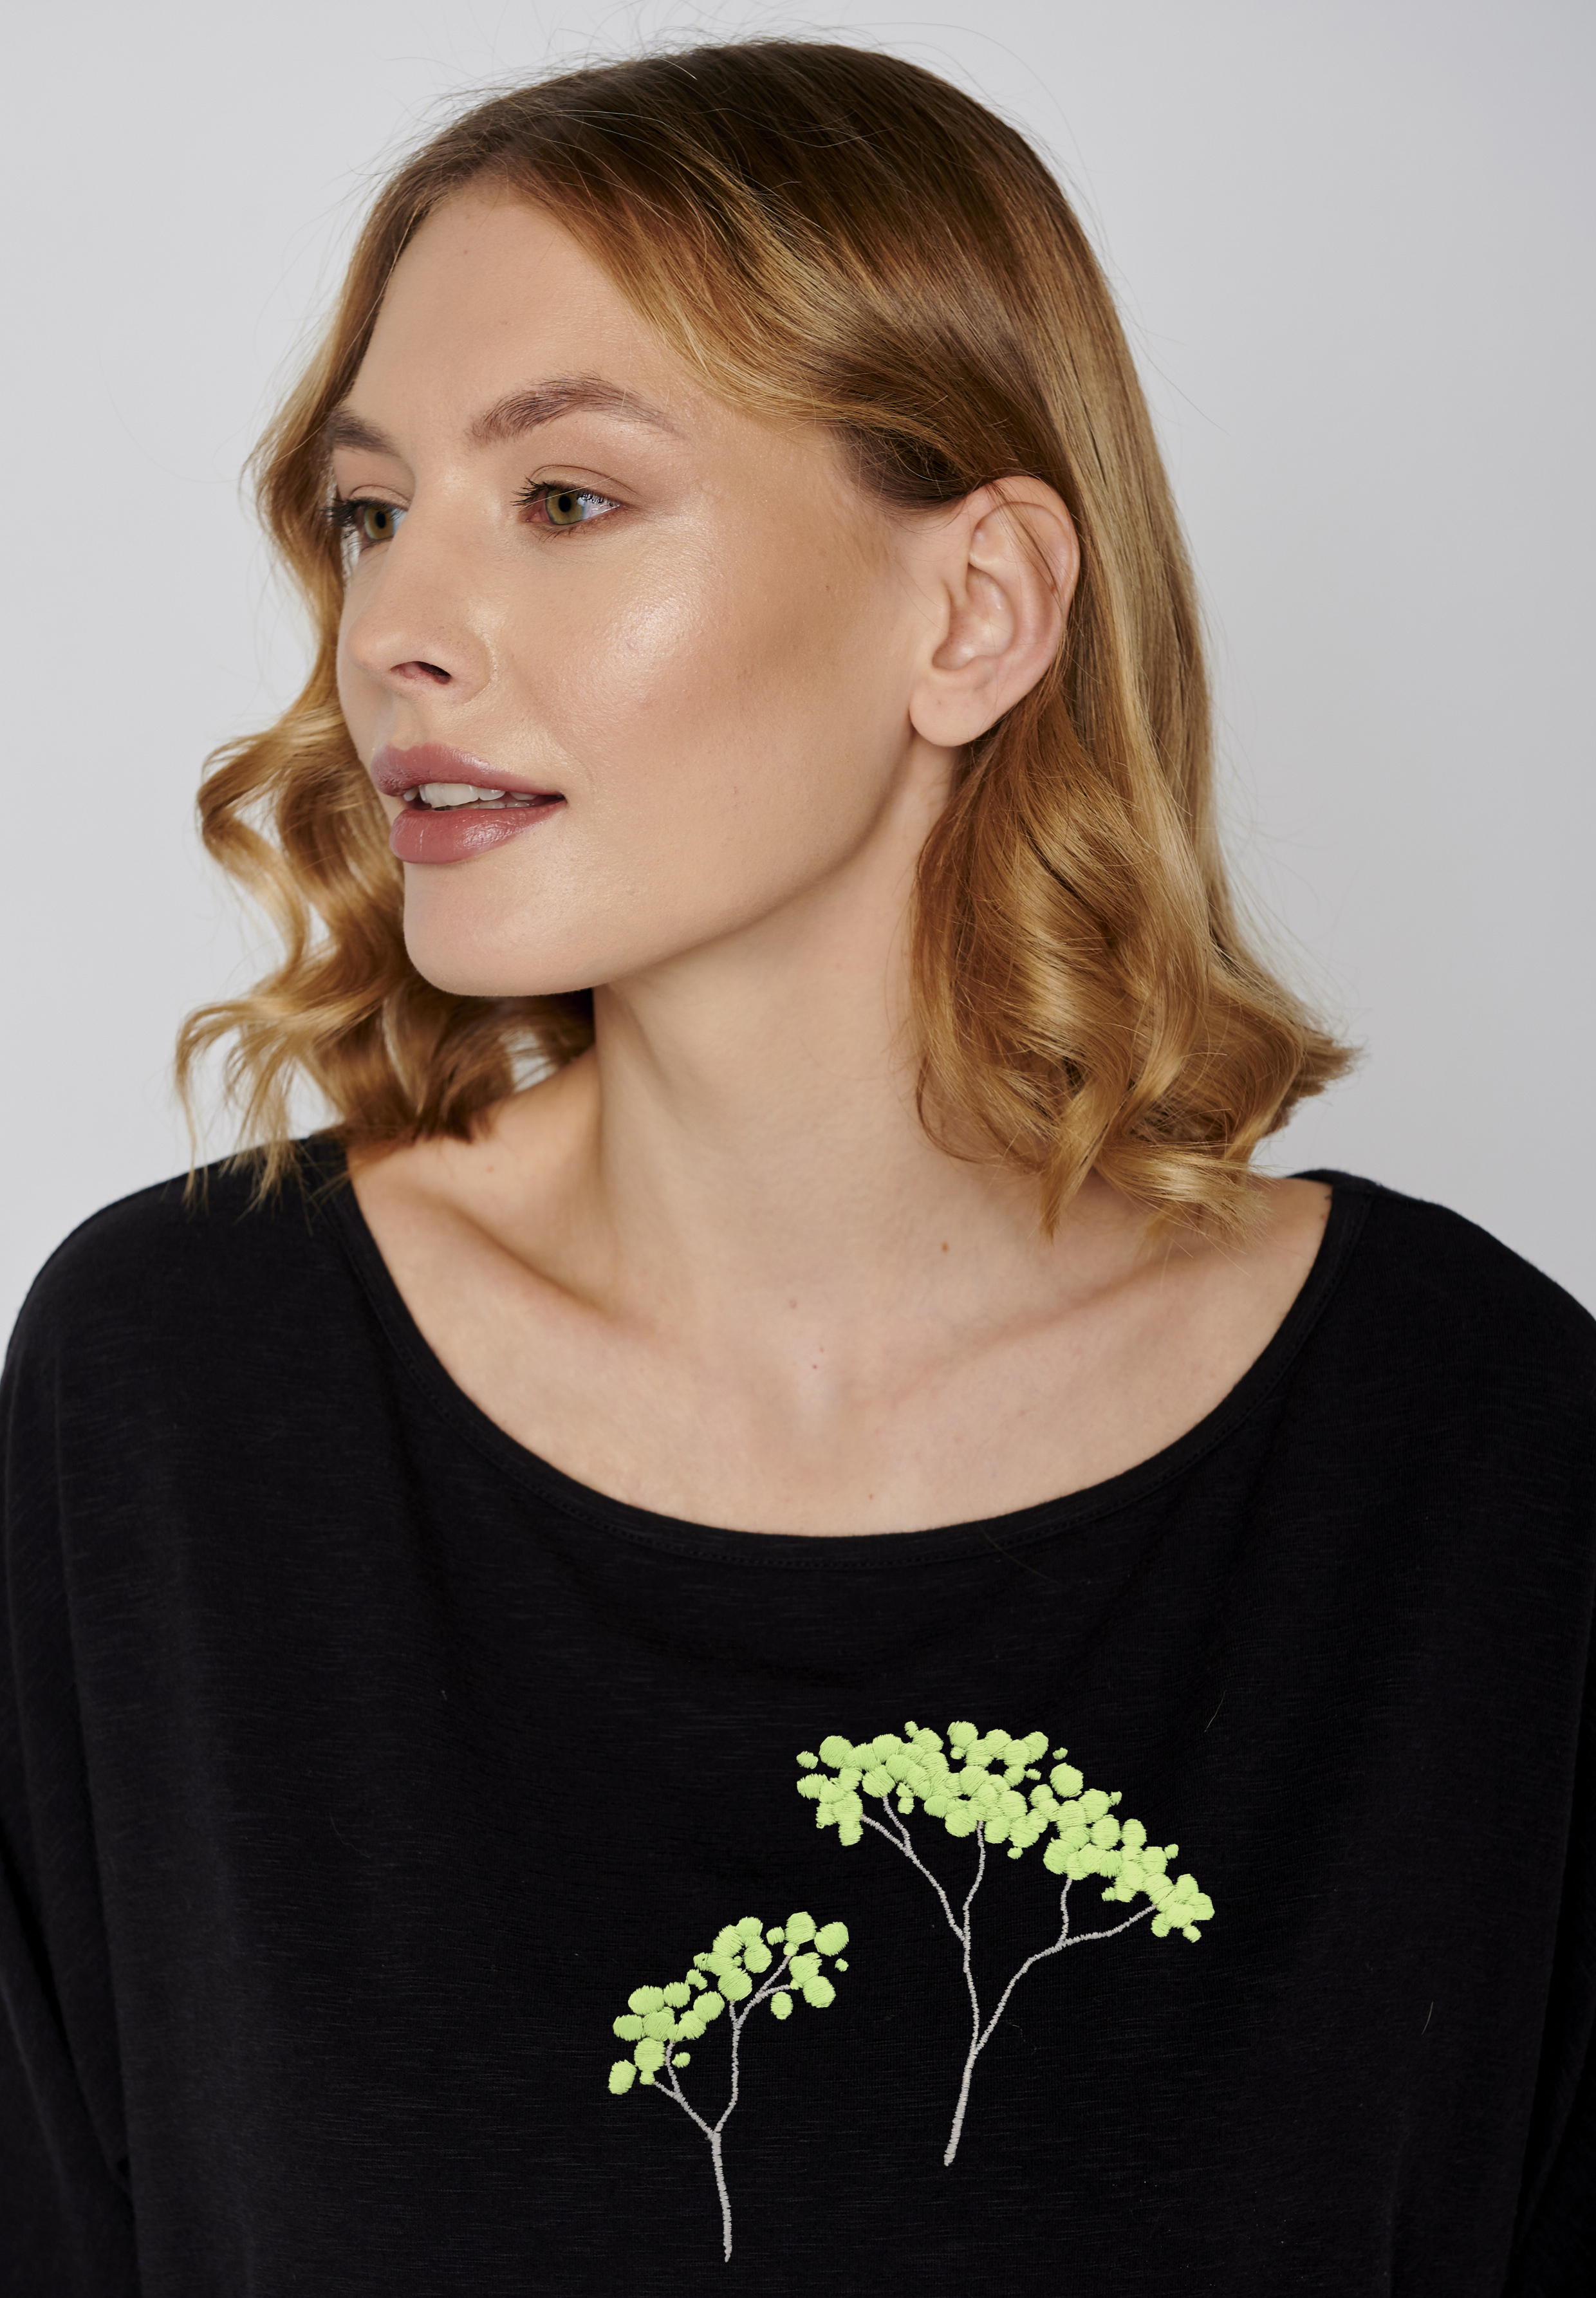 GREENBOMB-PLANT-TREES-Smile-Shirt-blackdetail